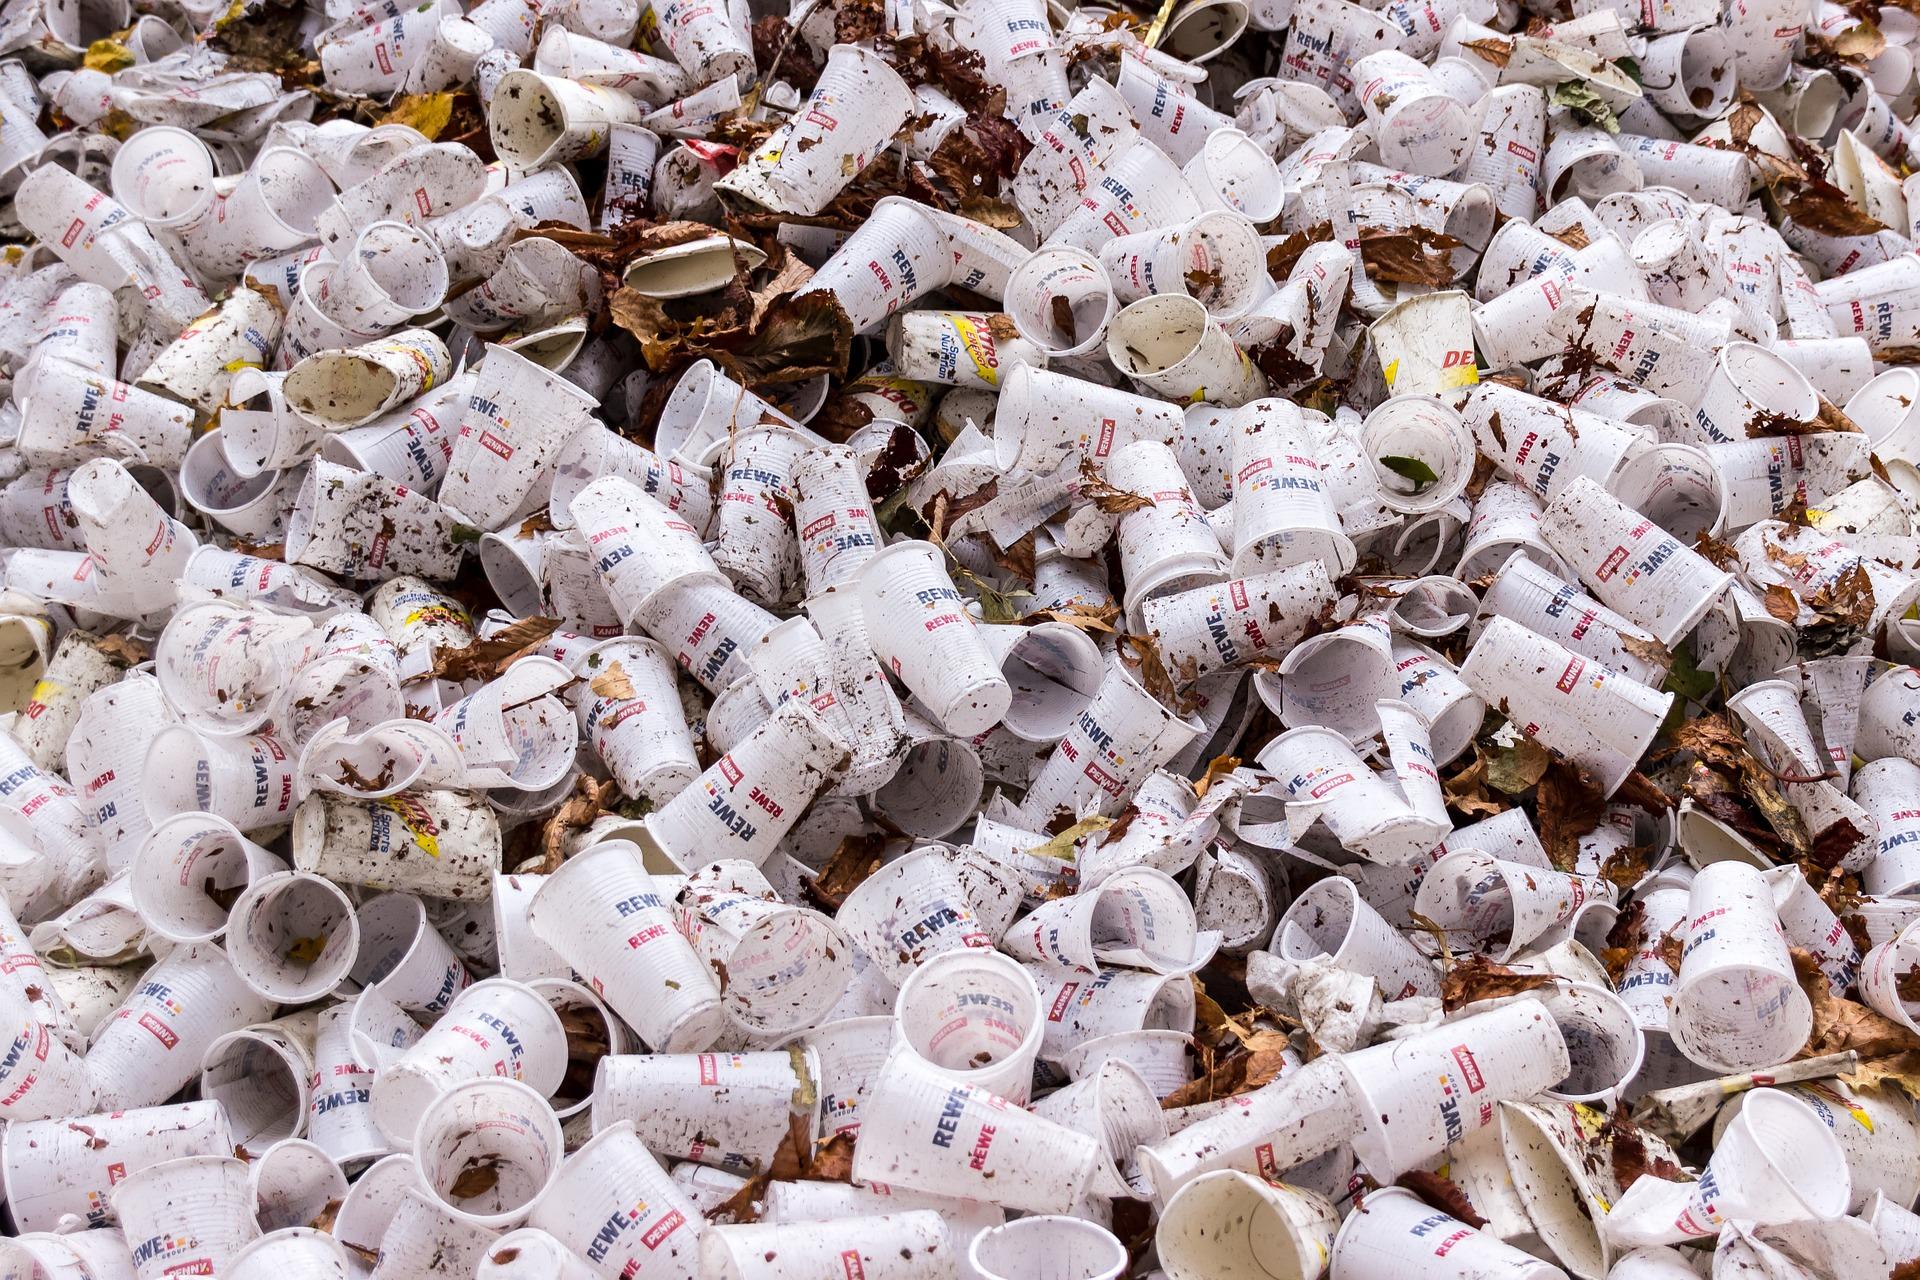 deposito temporaneo di rifiuti